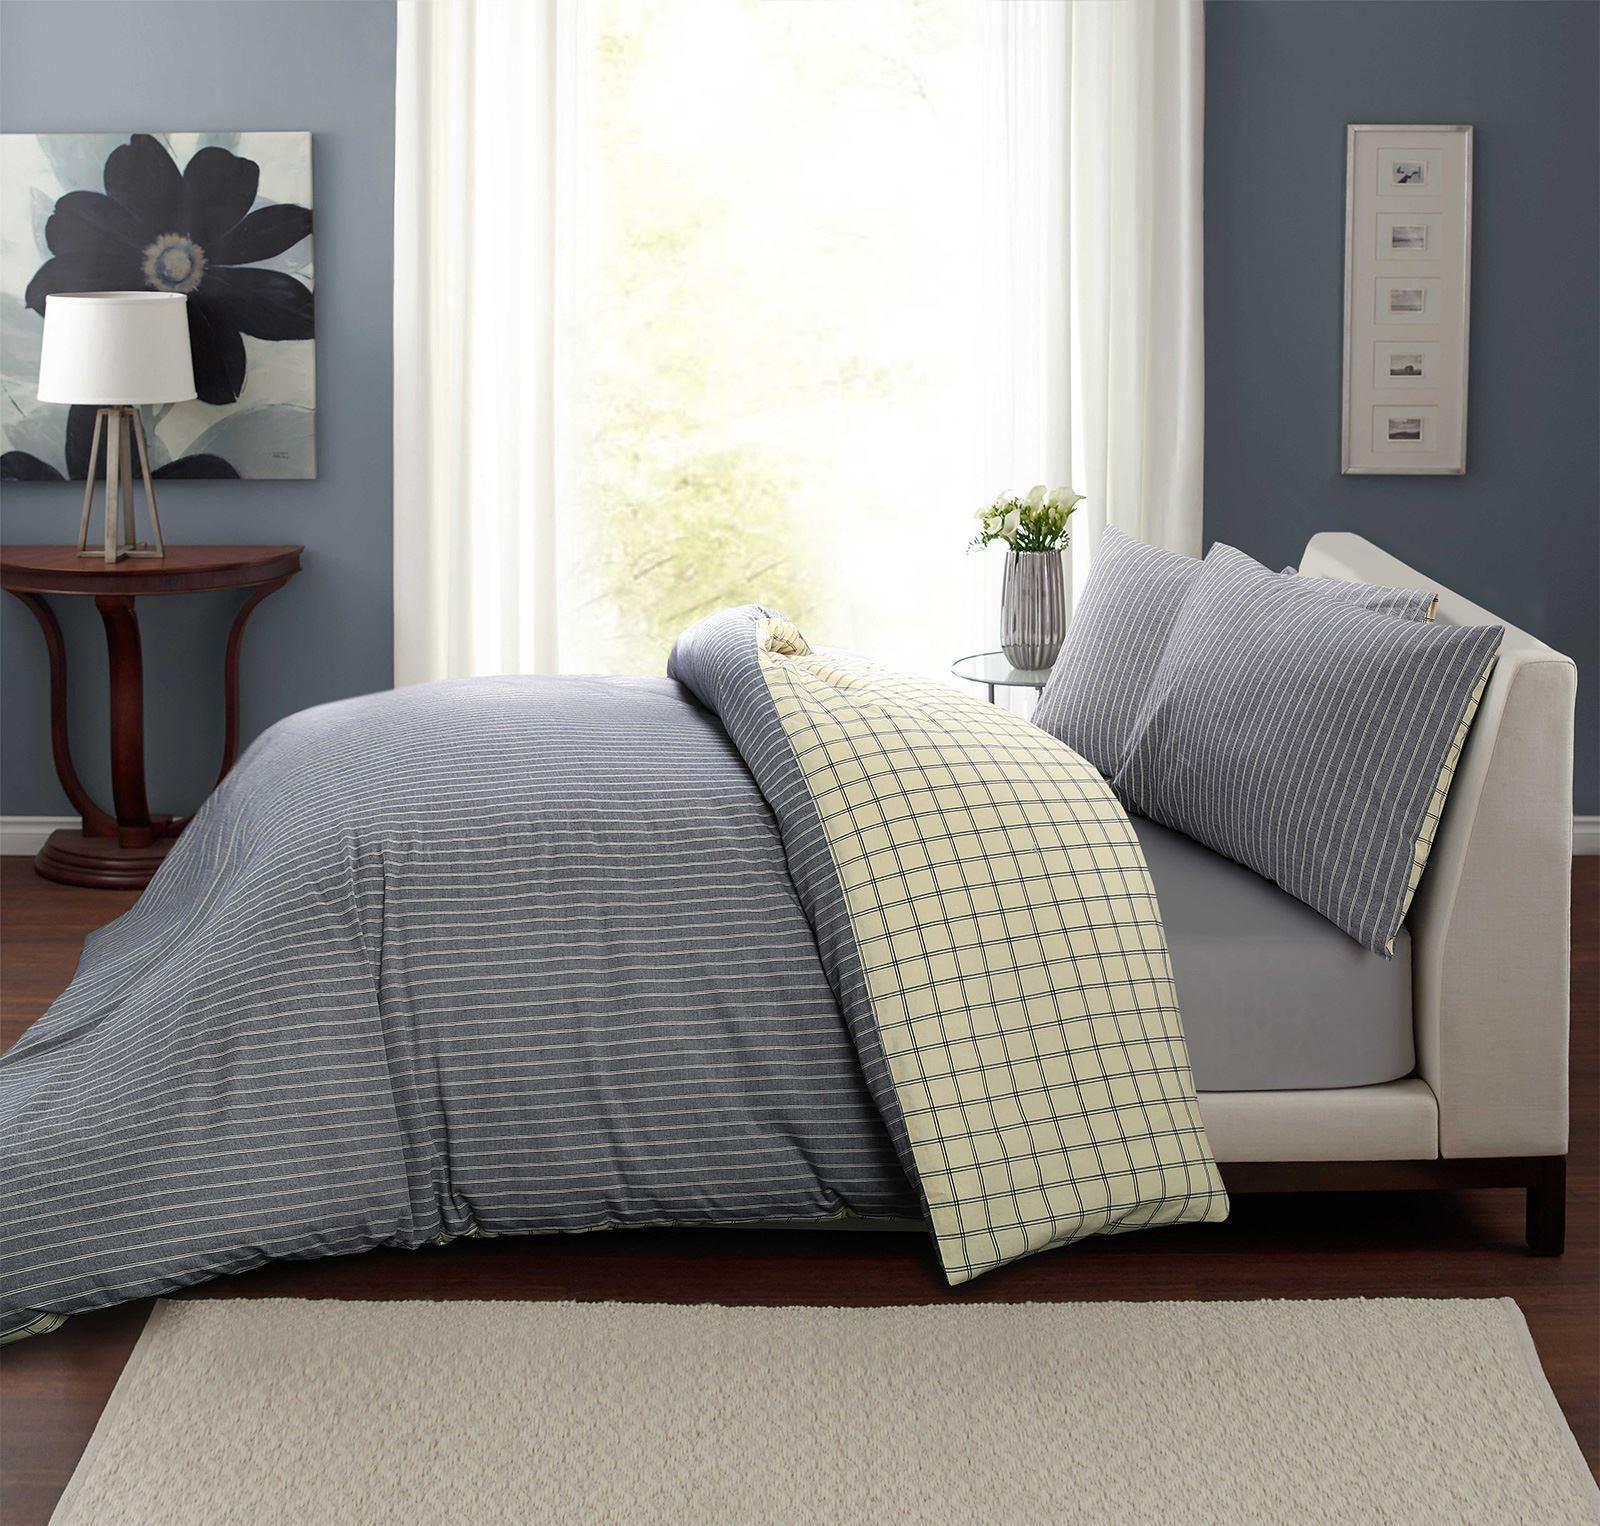 100-algodon-duvet-cover-set-raya-Cuadros-Reversible-Ropa-De-Cama-Individual-Doble-King miniatura 15